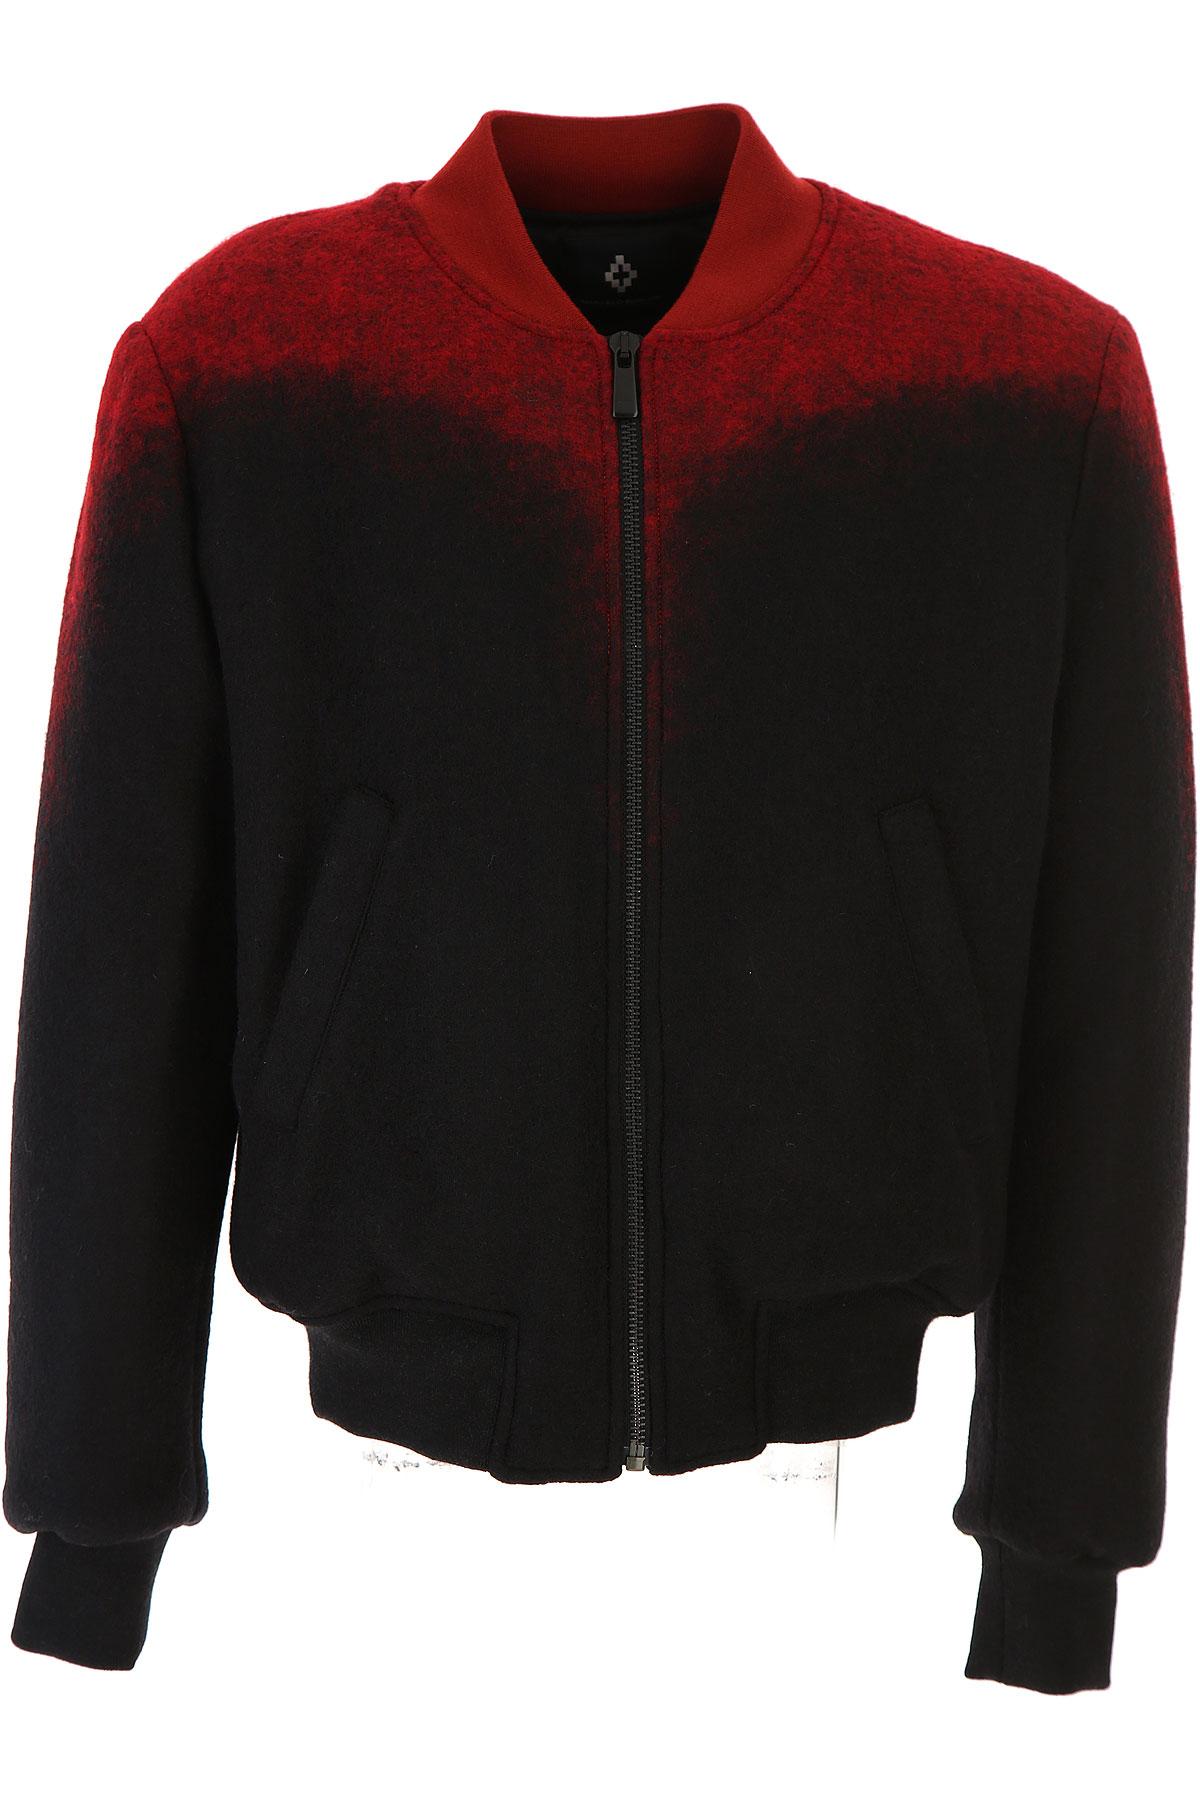 Image of Marcelo Burlon Jacket for Men, Red, Virgin wool, 2017, L S XL